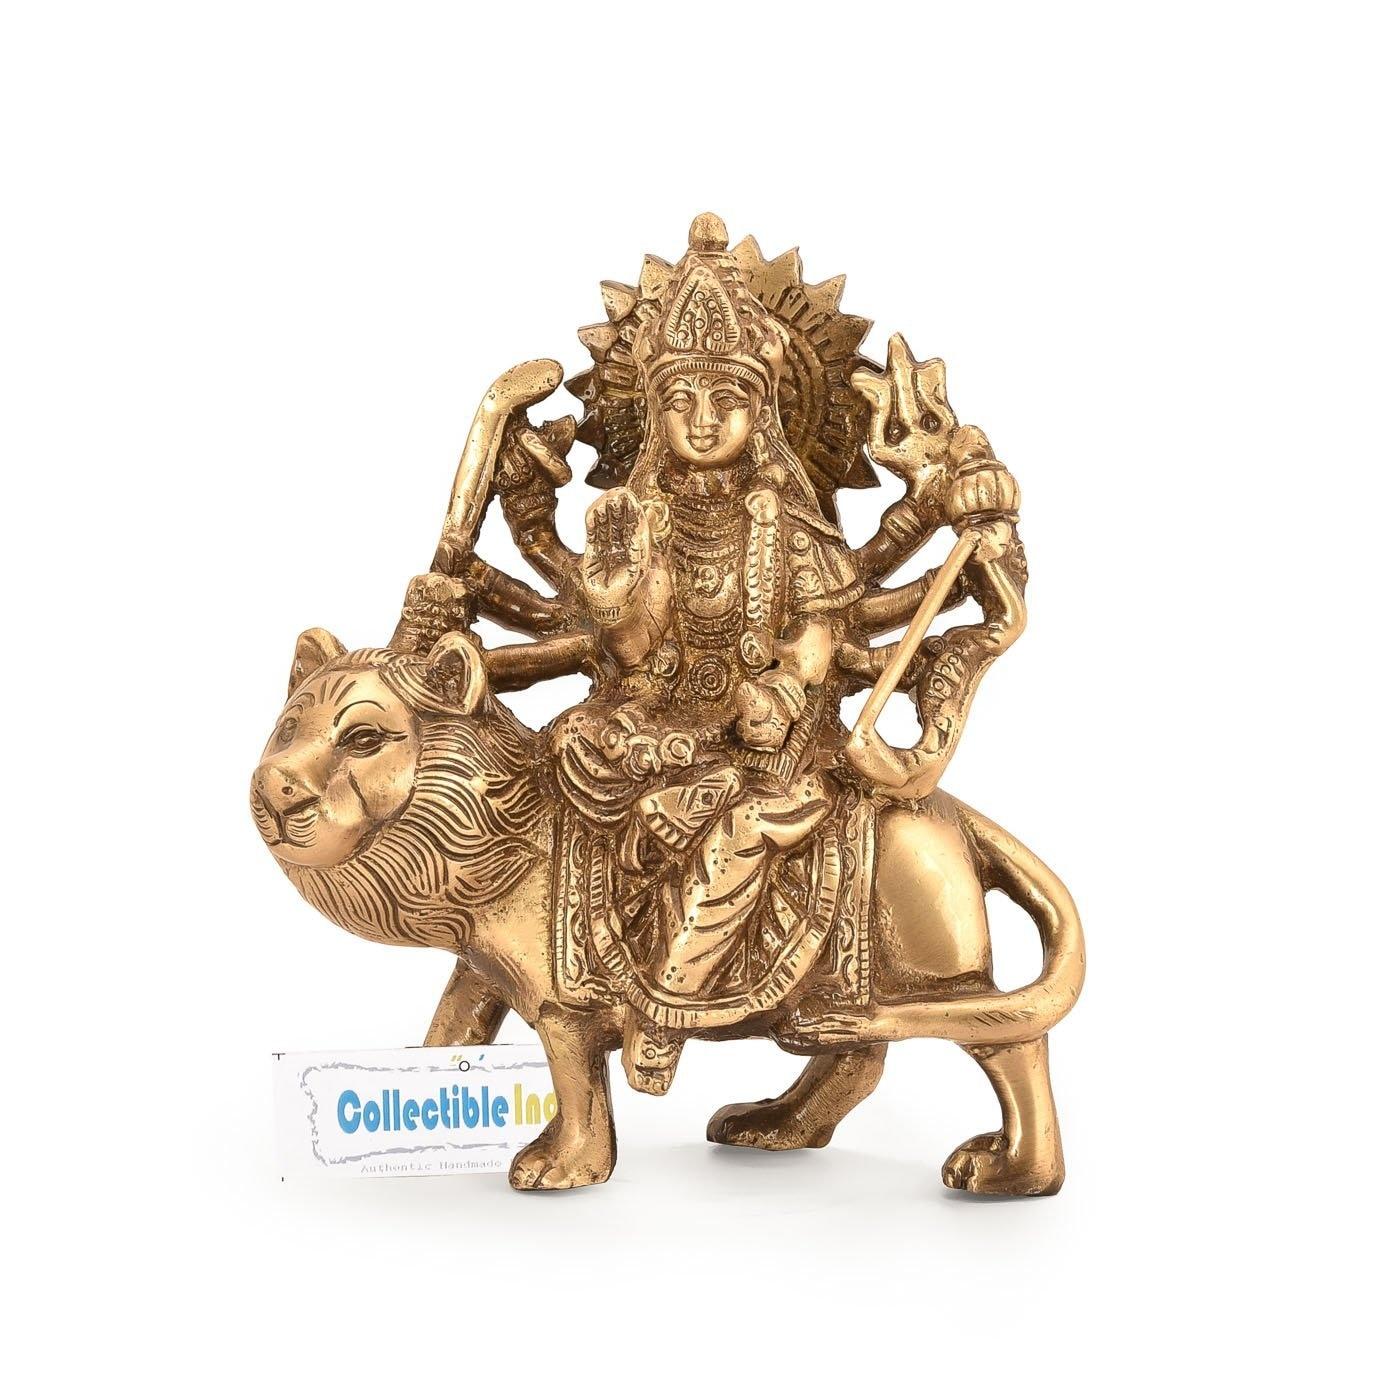 Durga, also known as